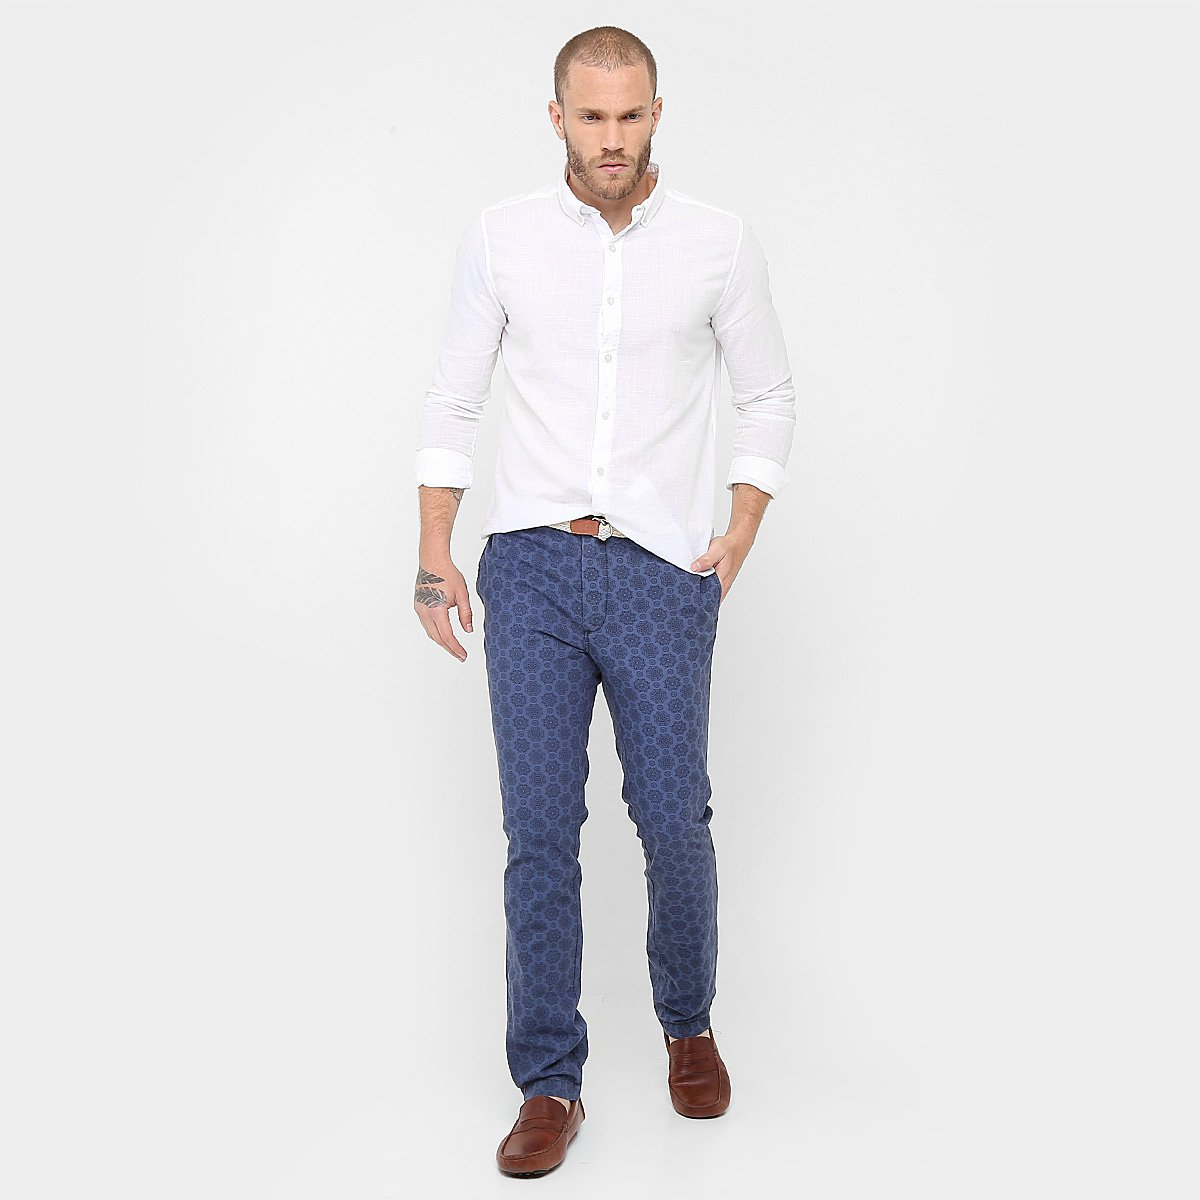 Calça Reserva Casual Arma Secreta Omega - Jeans